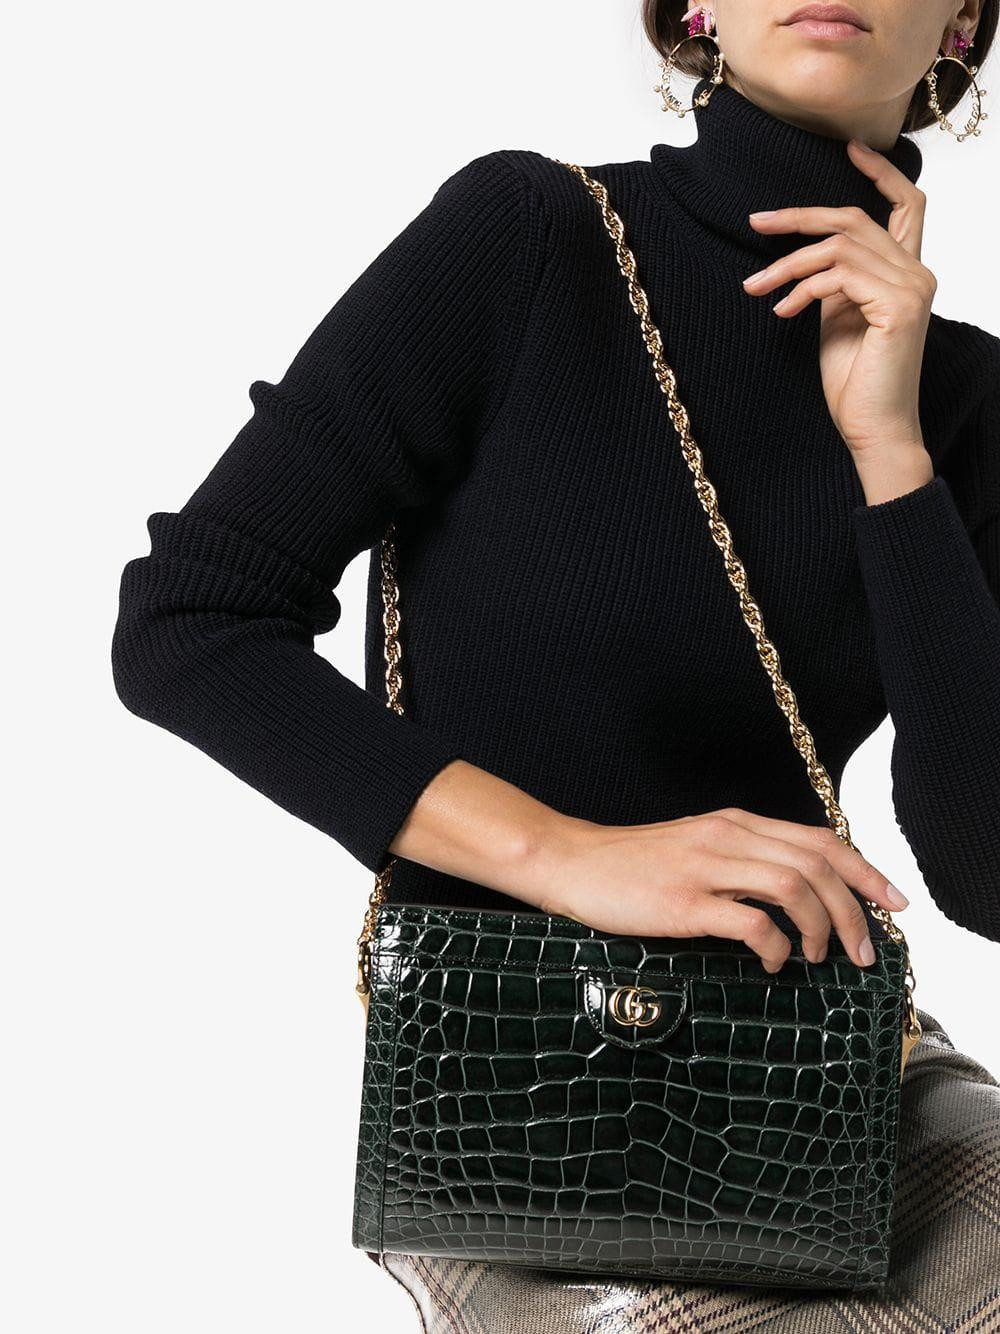 1b85e0f6c9e Gucci Green Ophidia Small Crocodile Leather Shoulder Bag in Green - Lyst